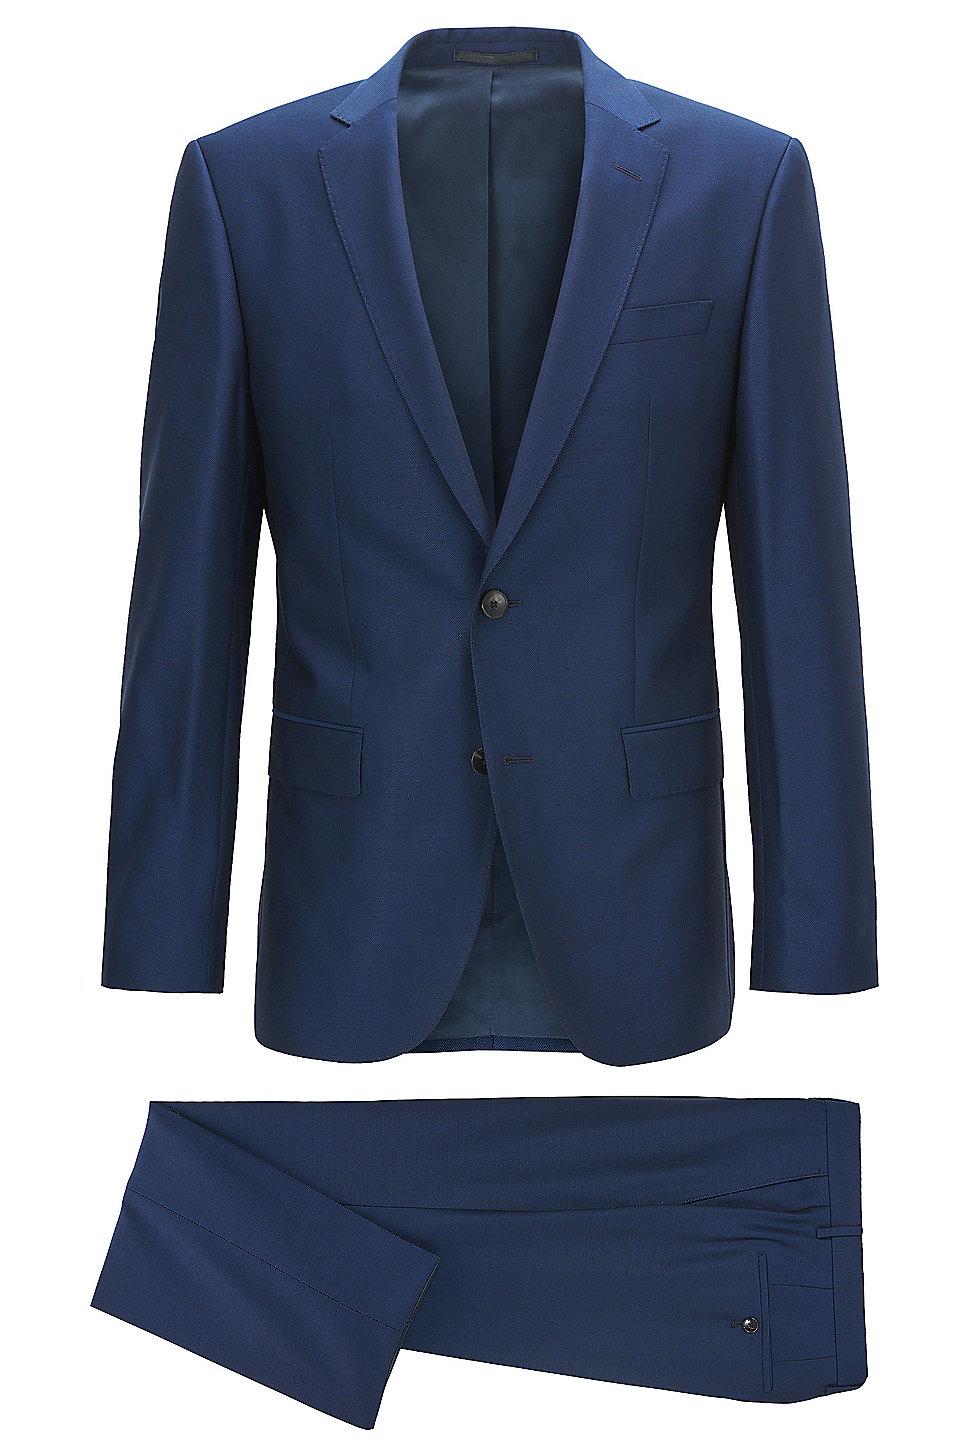 HUGO BOSS suits for men | Distinctive & elegant